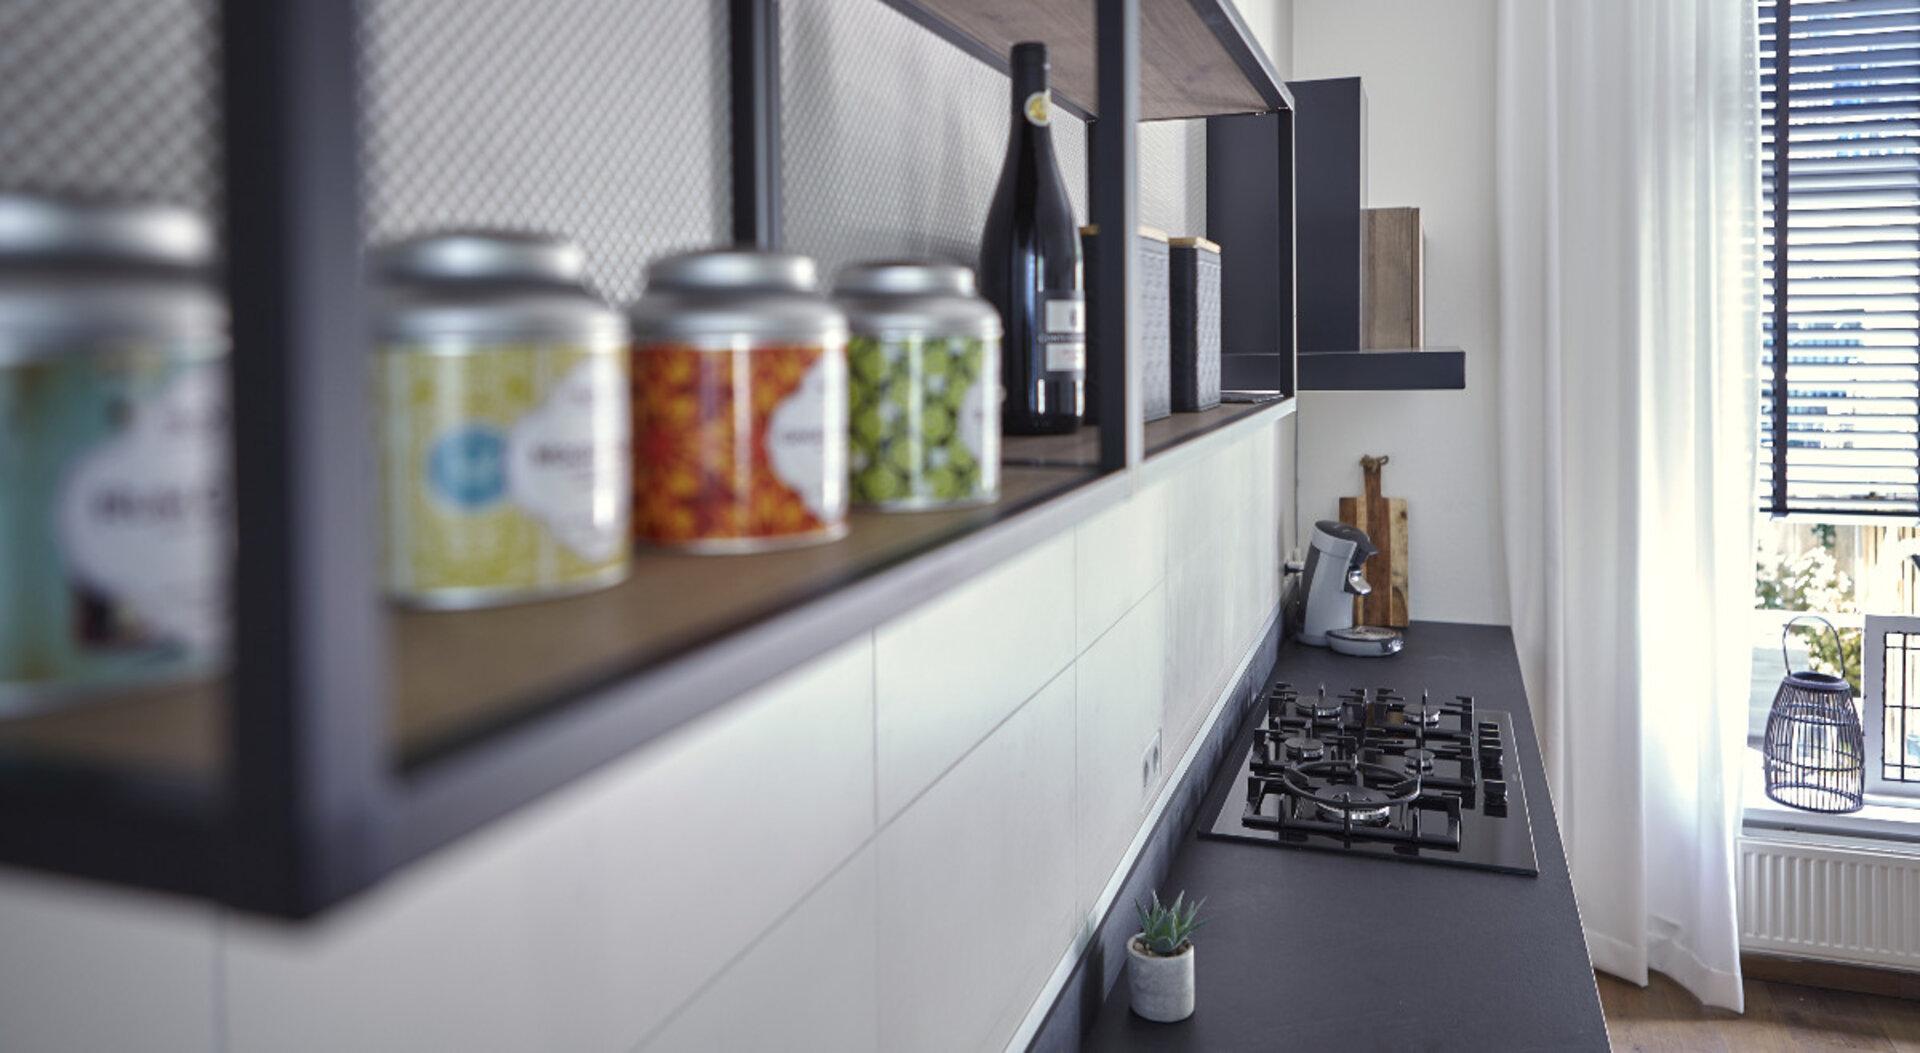 Betonnen keuken inspiratie